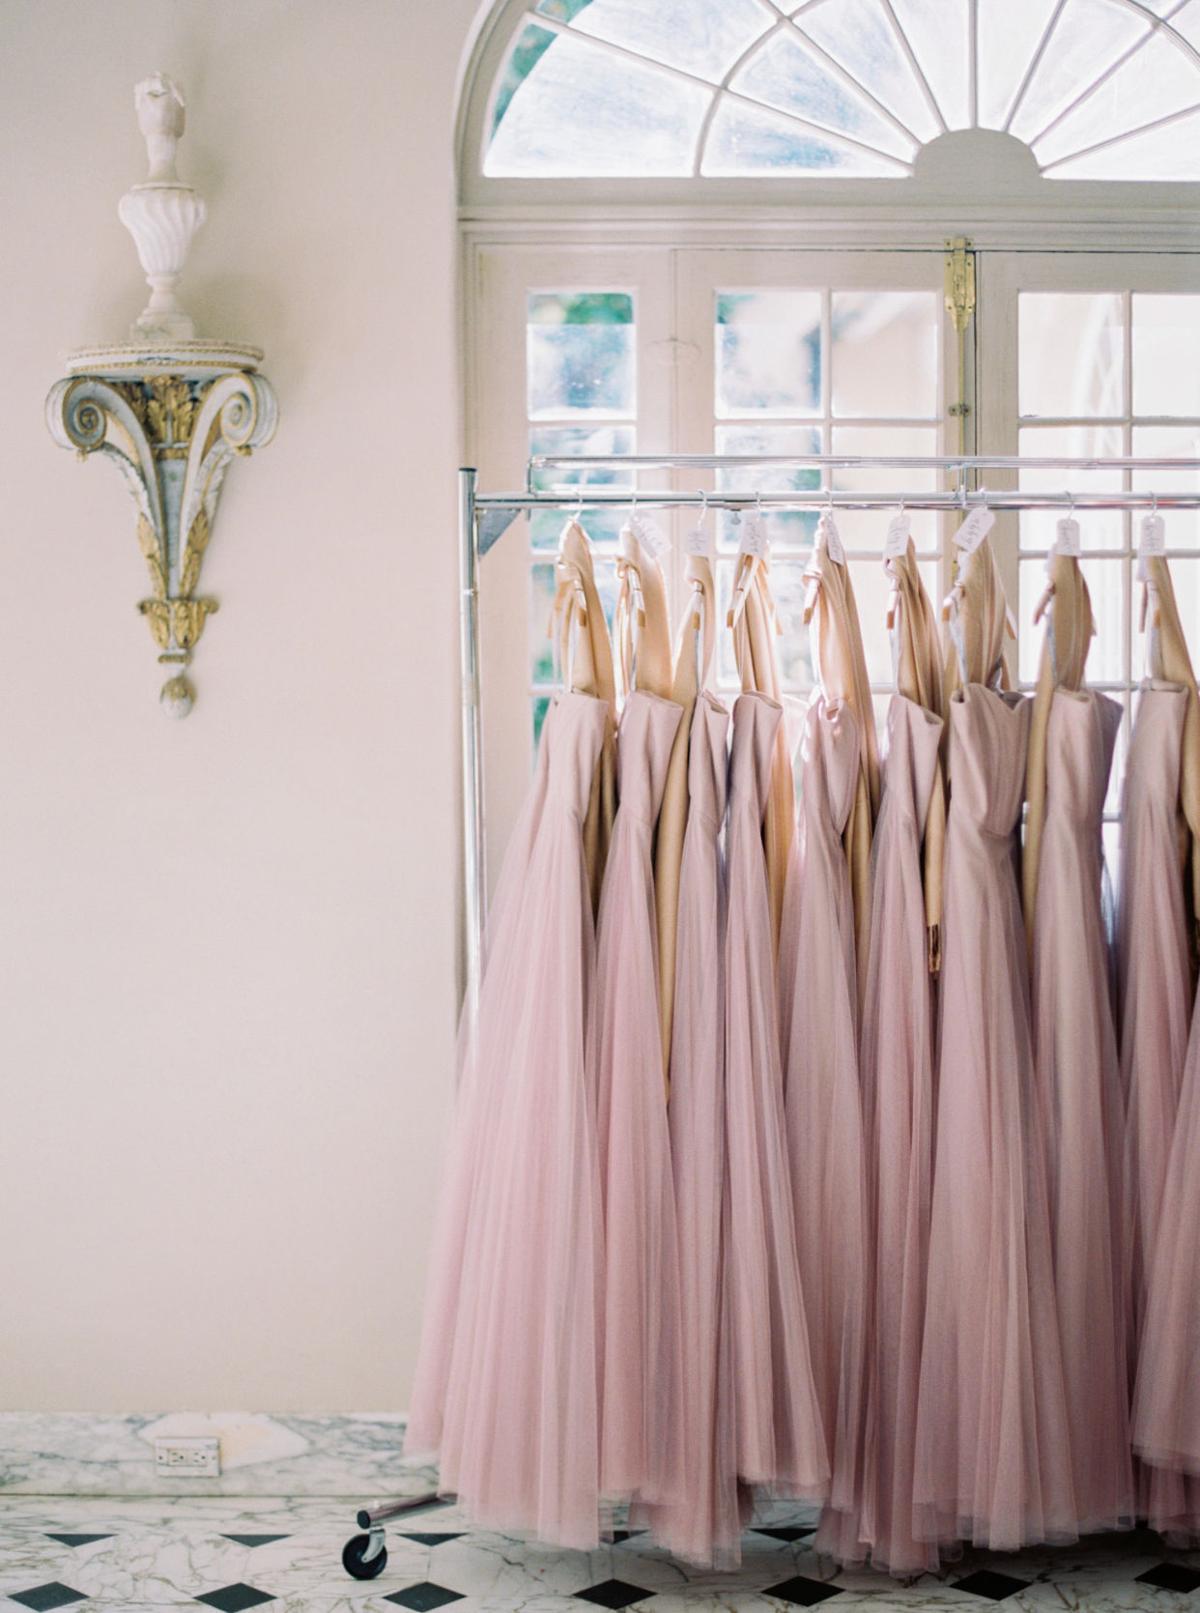 Greer_dresses.jpeg